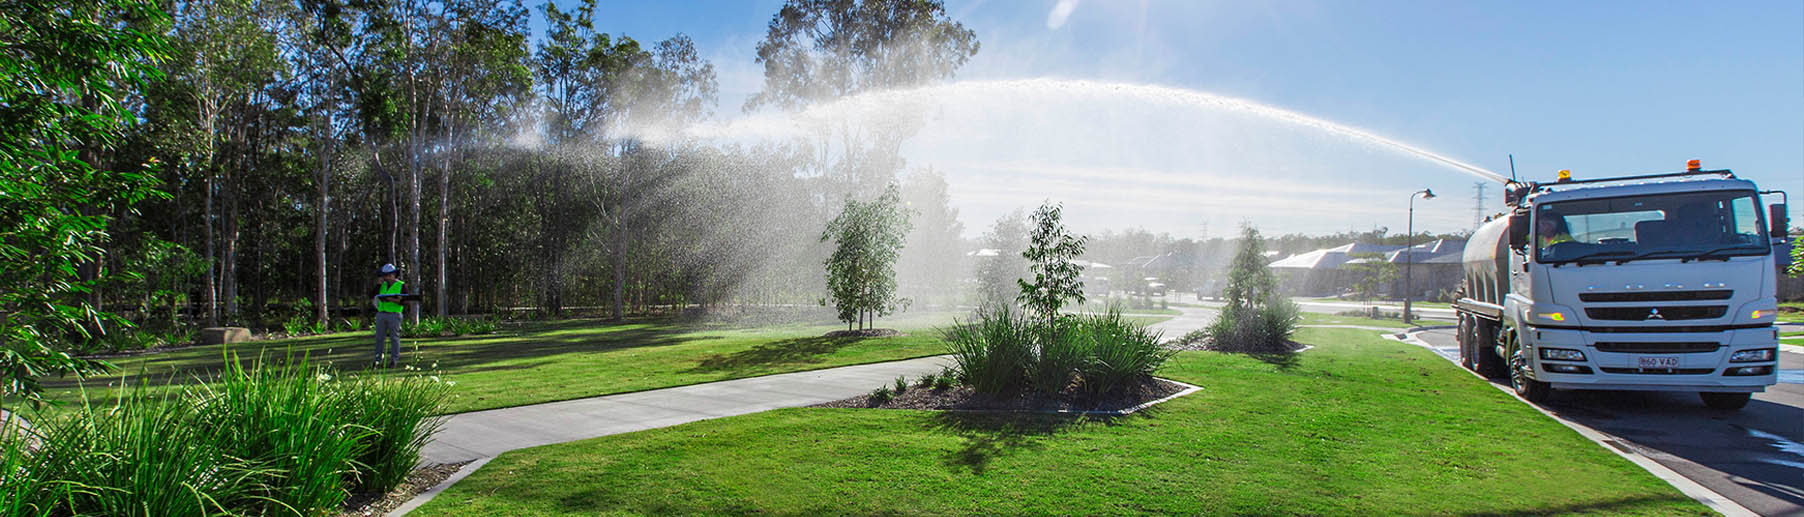 truck watering grass